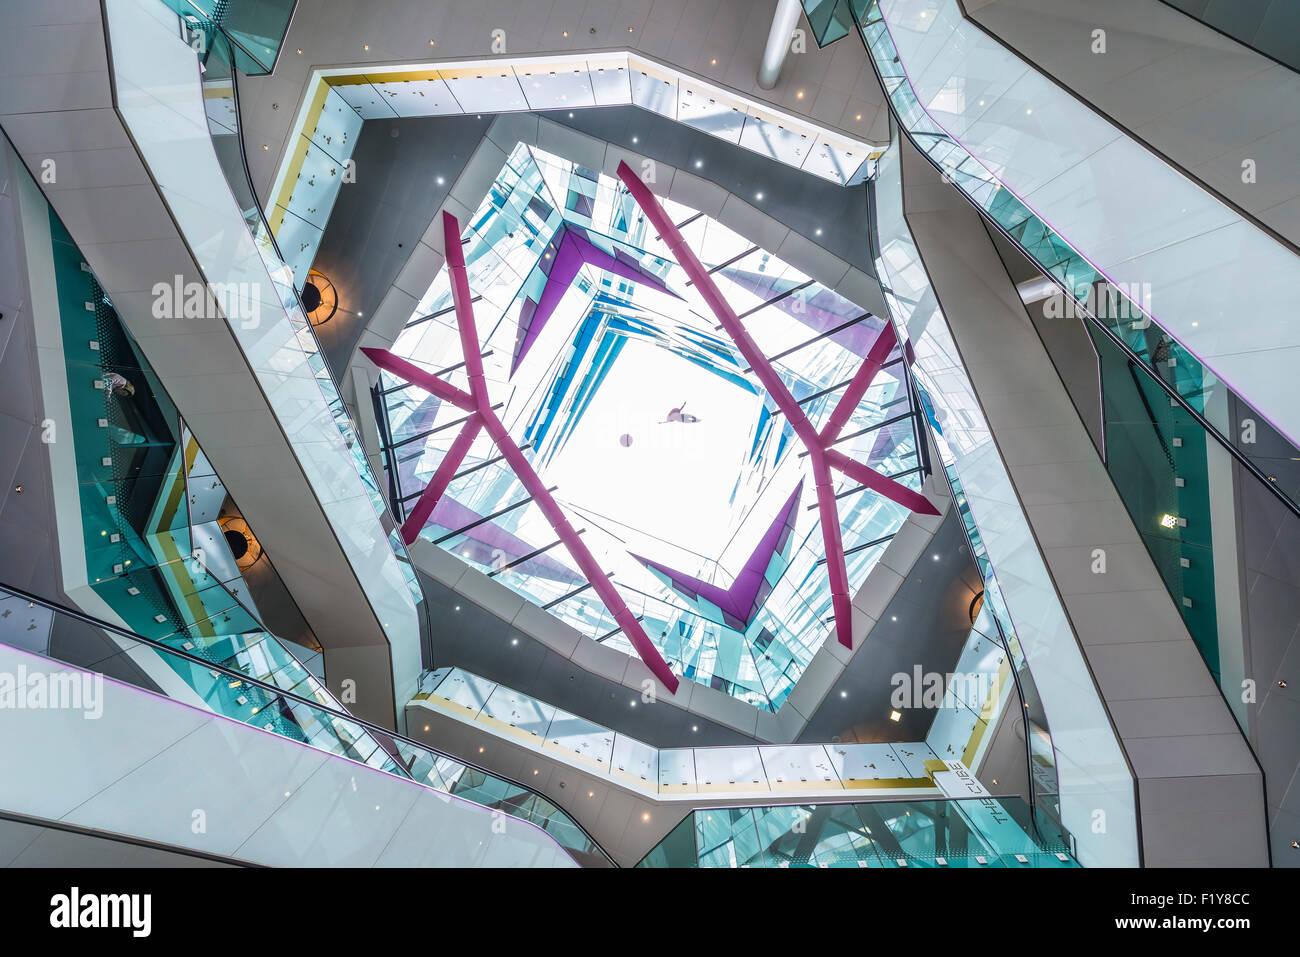 The Cube interiors, Birmingham Stock Photo: 87265820 - Alamy